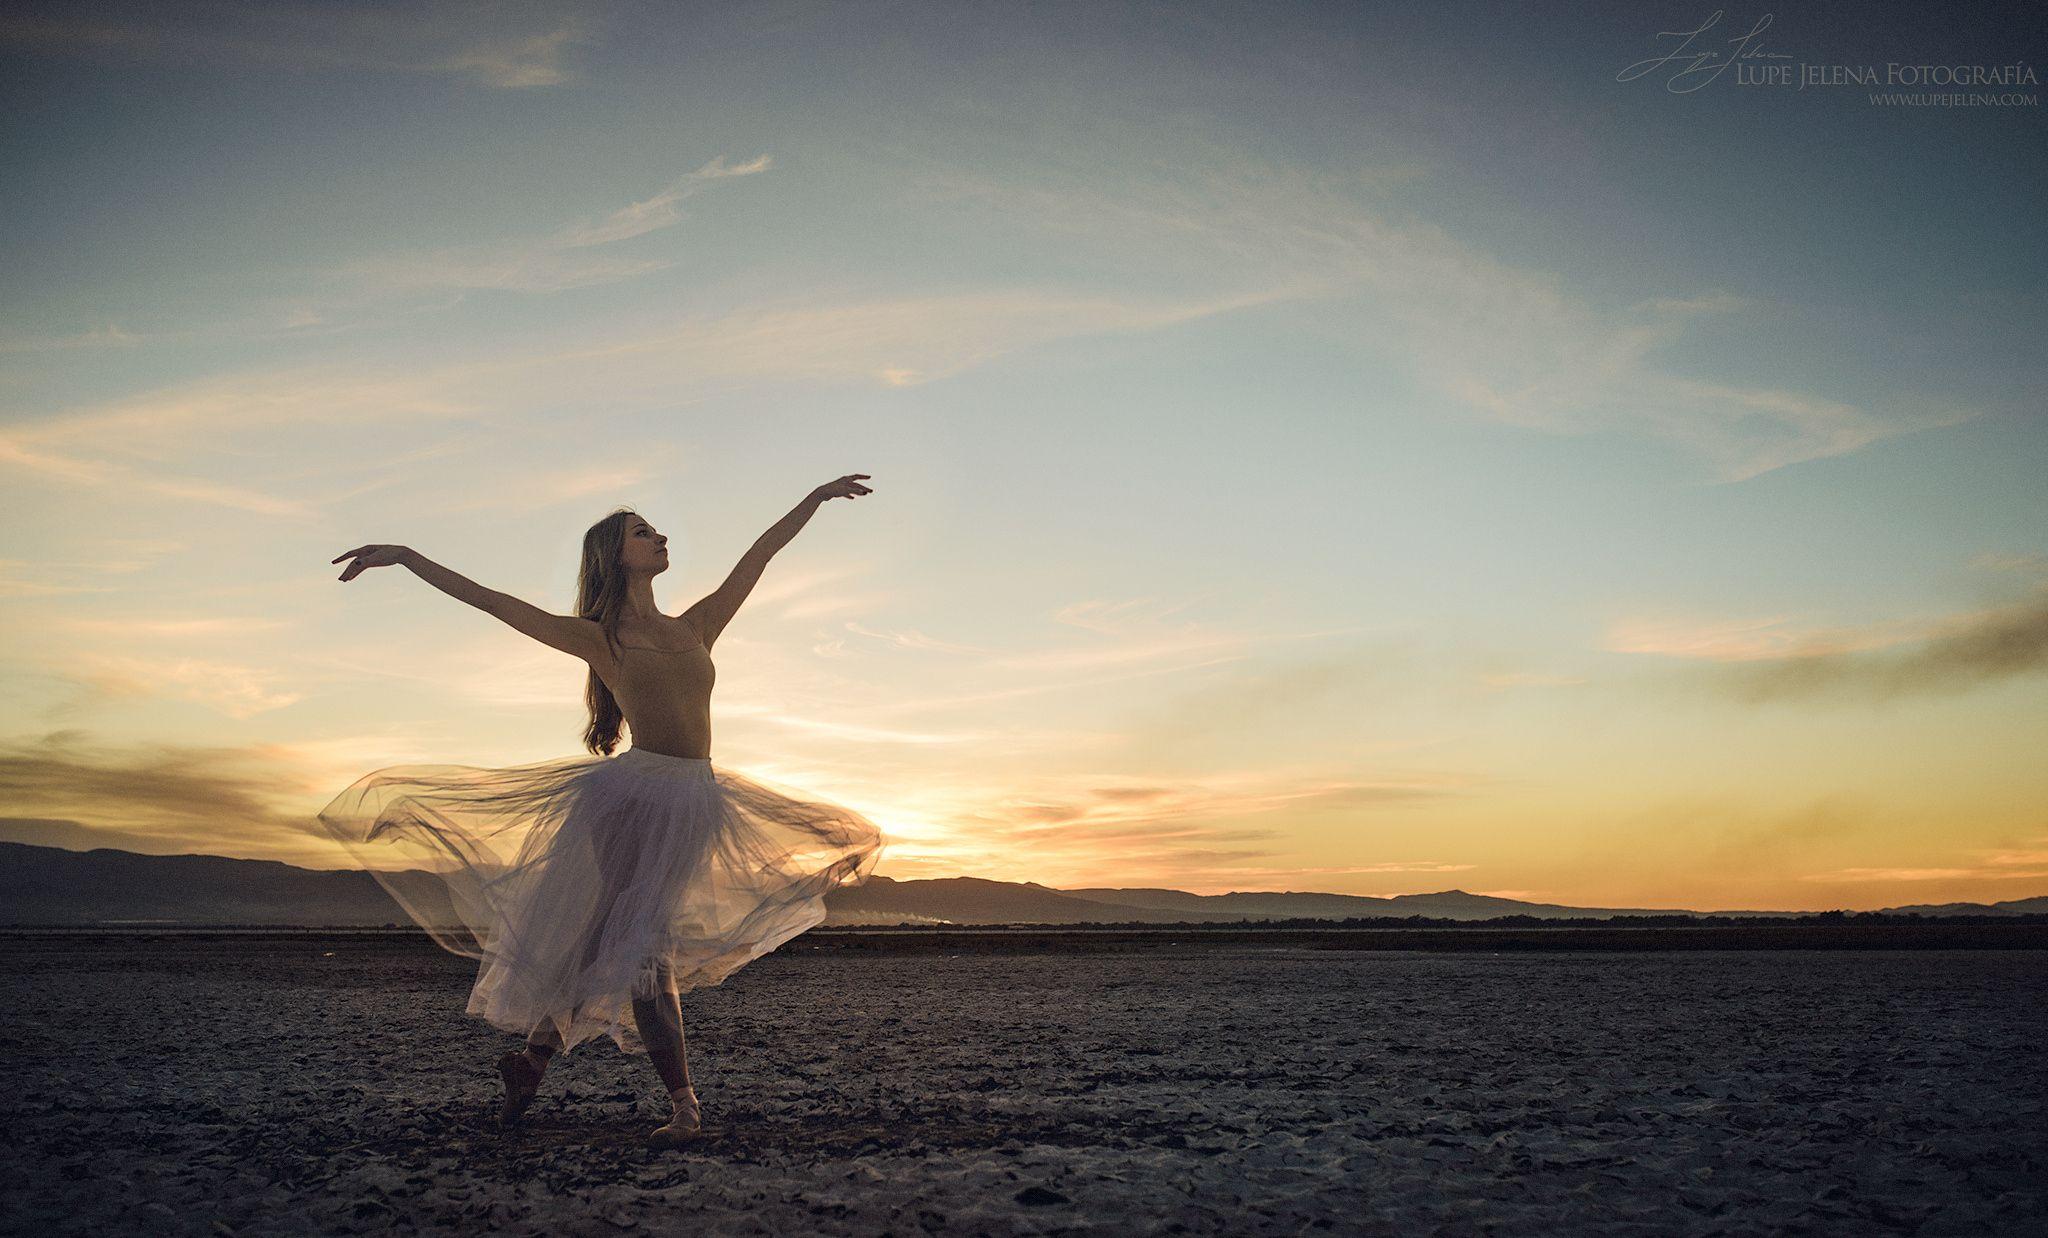 Loredana - Dancer: Loredana Pernazza Producer: Alejandro Gutierrez Assistants: Lucero Maya y Paola Paz Photo: Lupe Jelena  Laguna Seca de Sayula, Jalisco, México  www.lupejelena.com